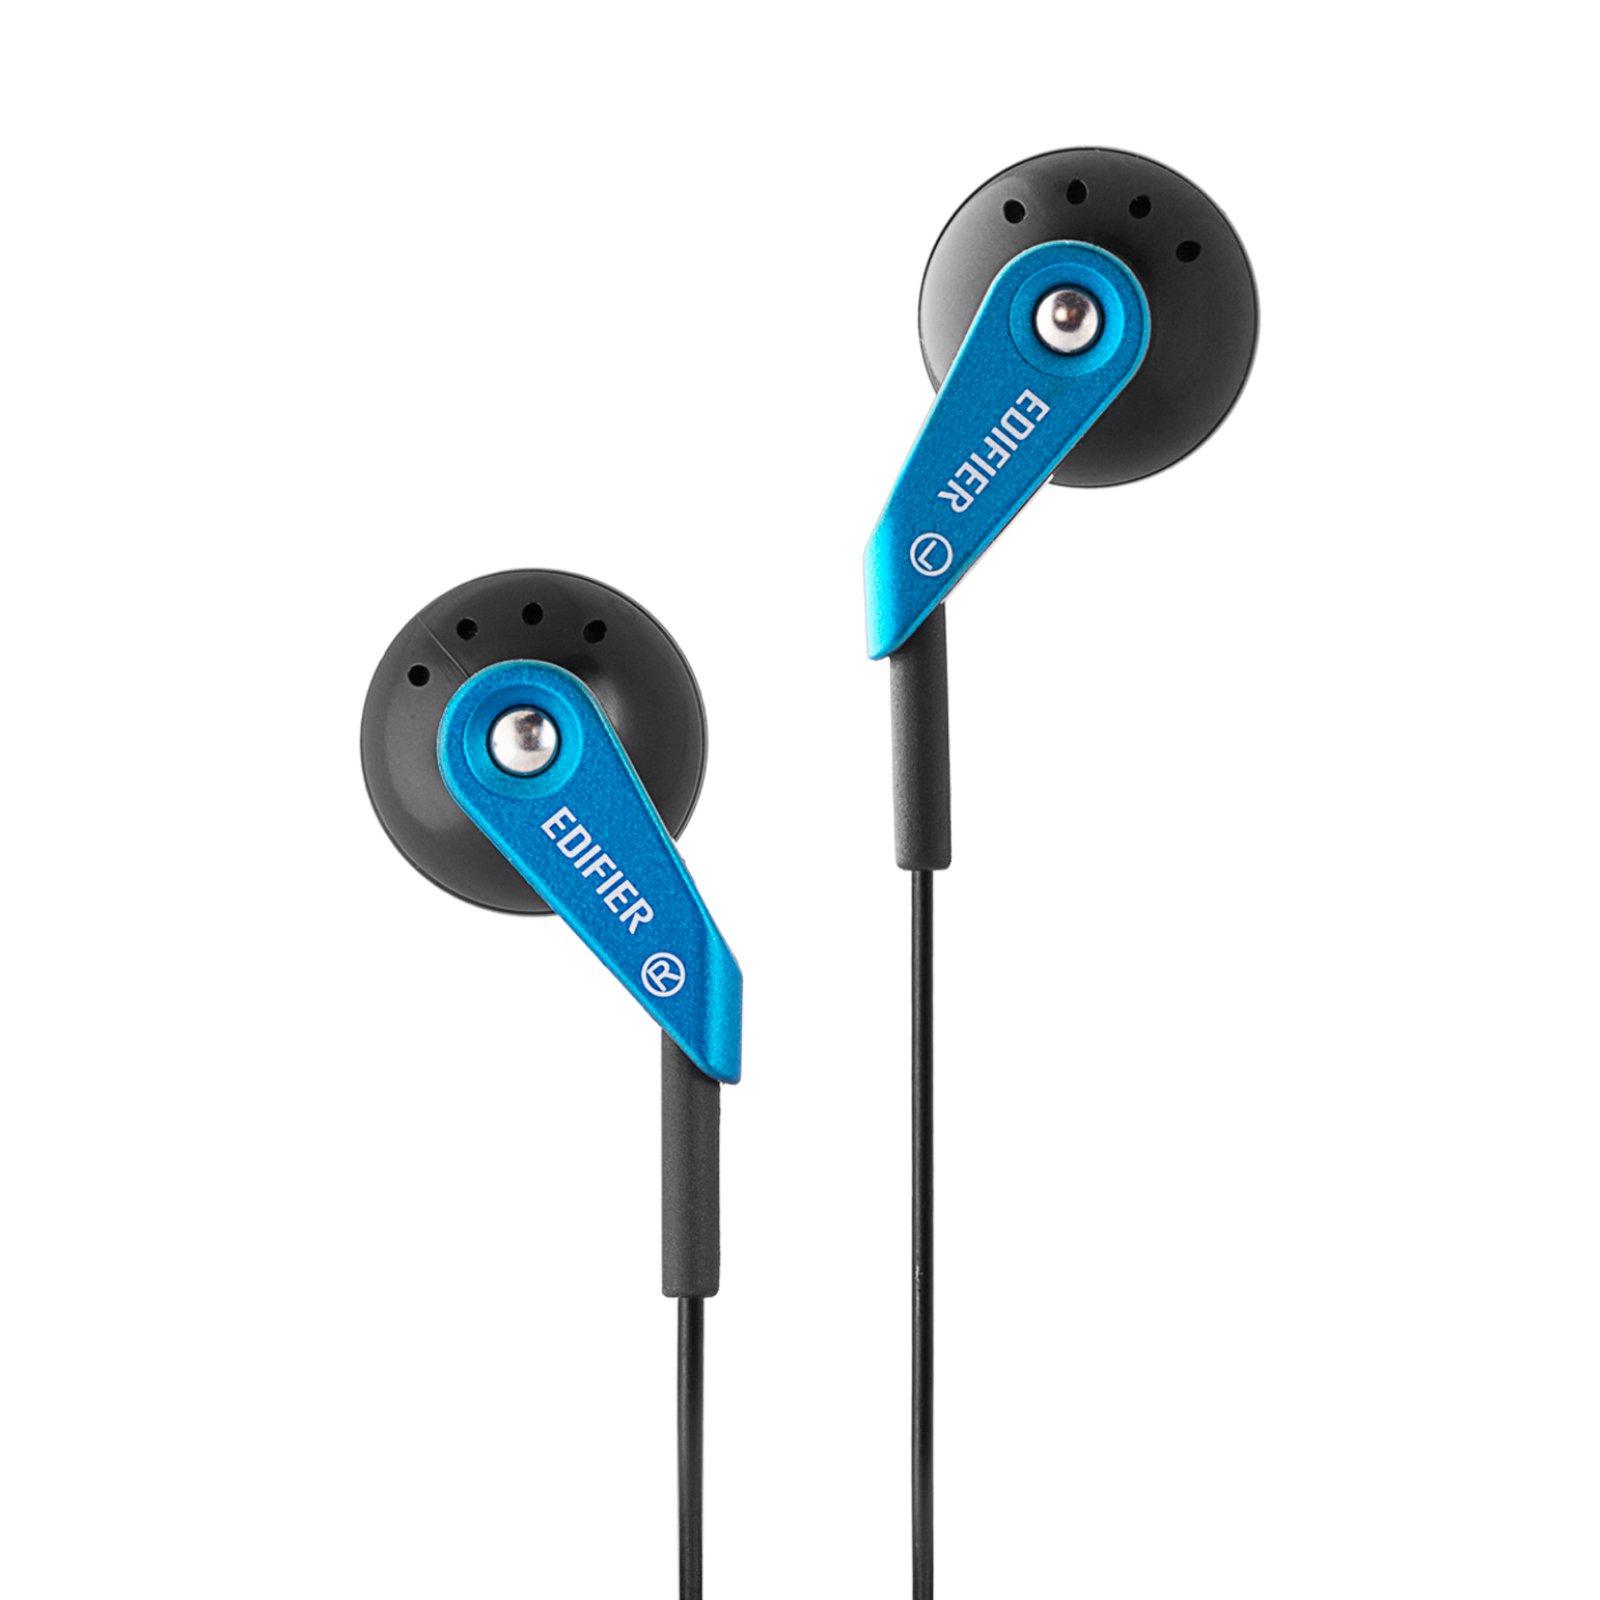 Edifier H185 Headphones Hi-Fi Classic Earbud Style Earphones - Blue